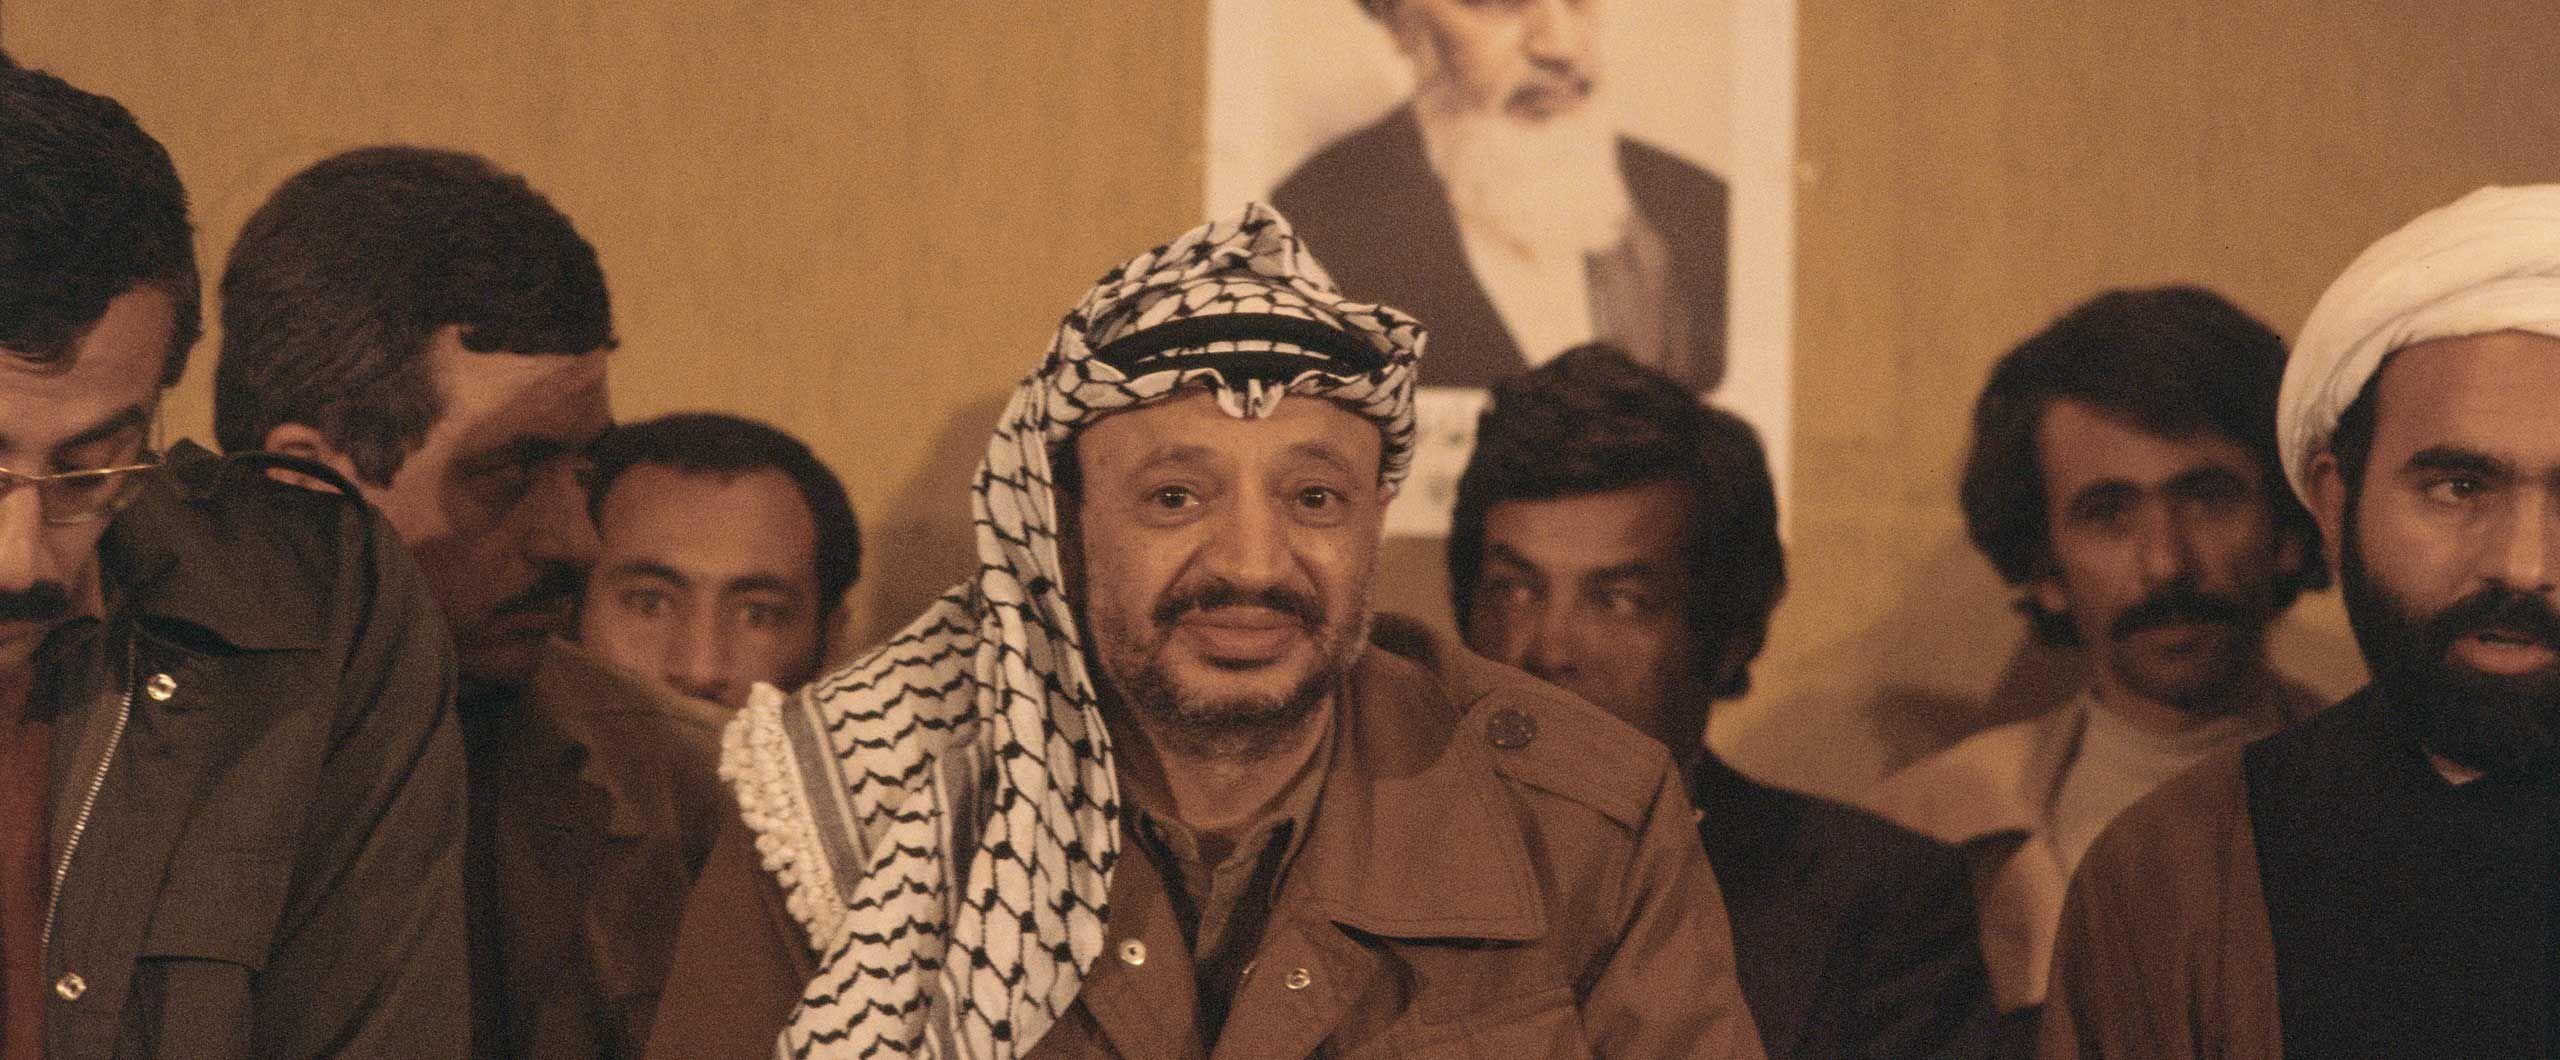 Iranian Revolution: Arafat and the Ayatollahs - Tablet Magazine